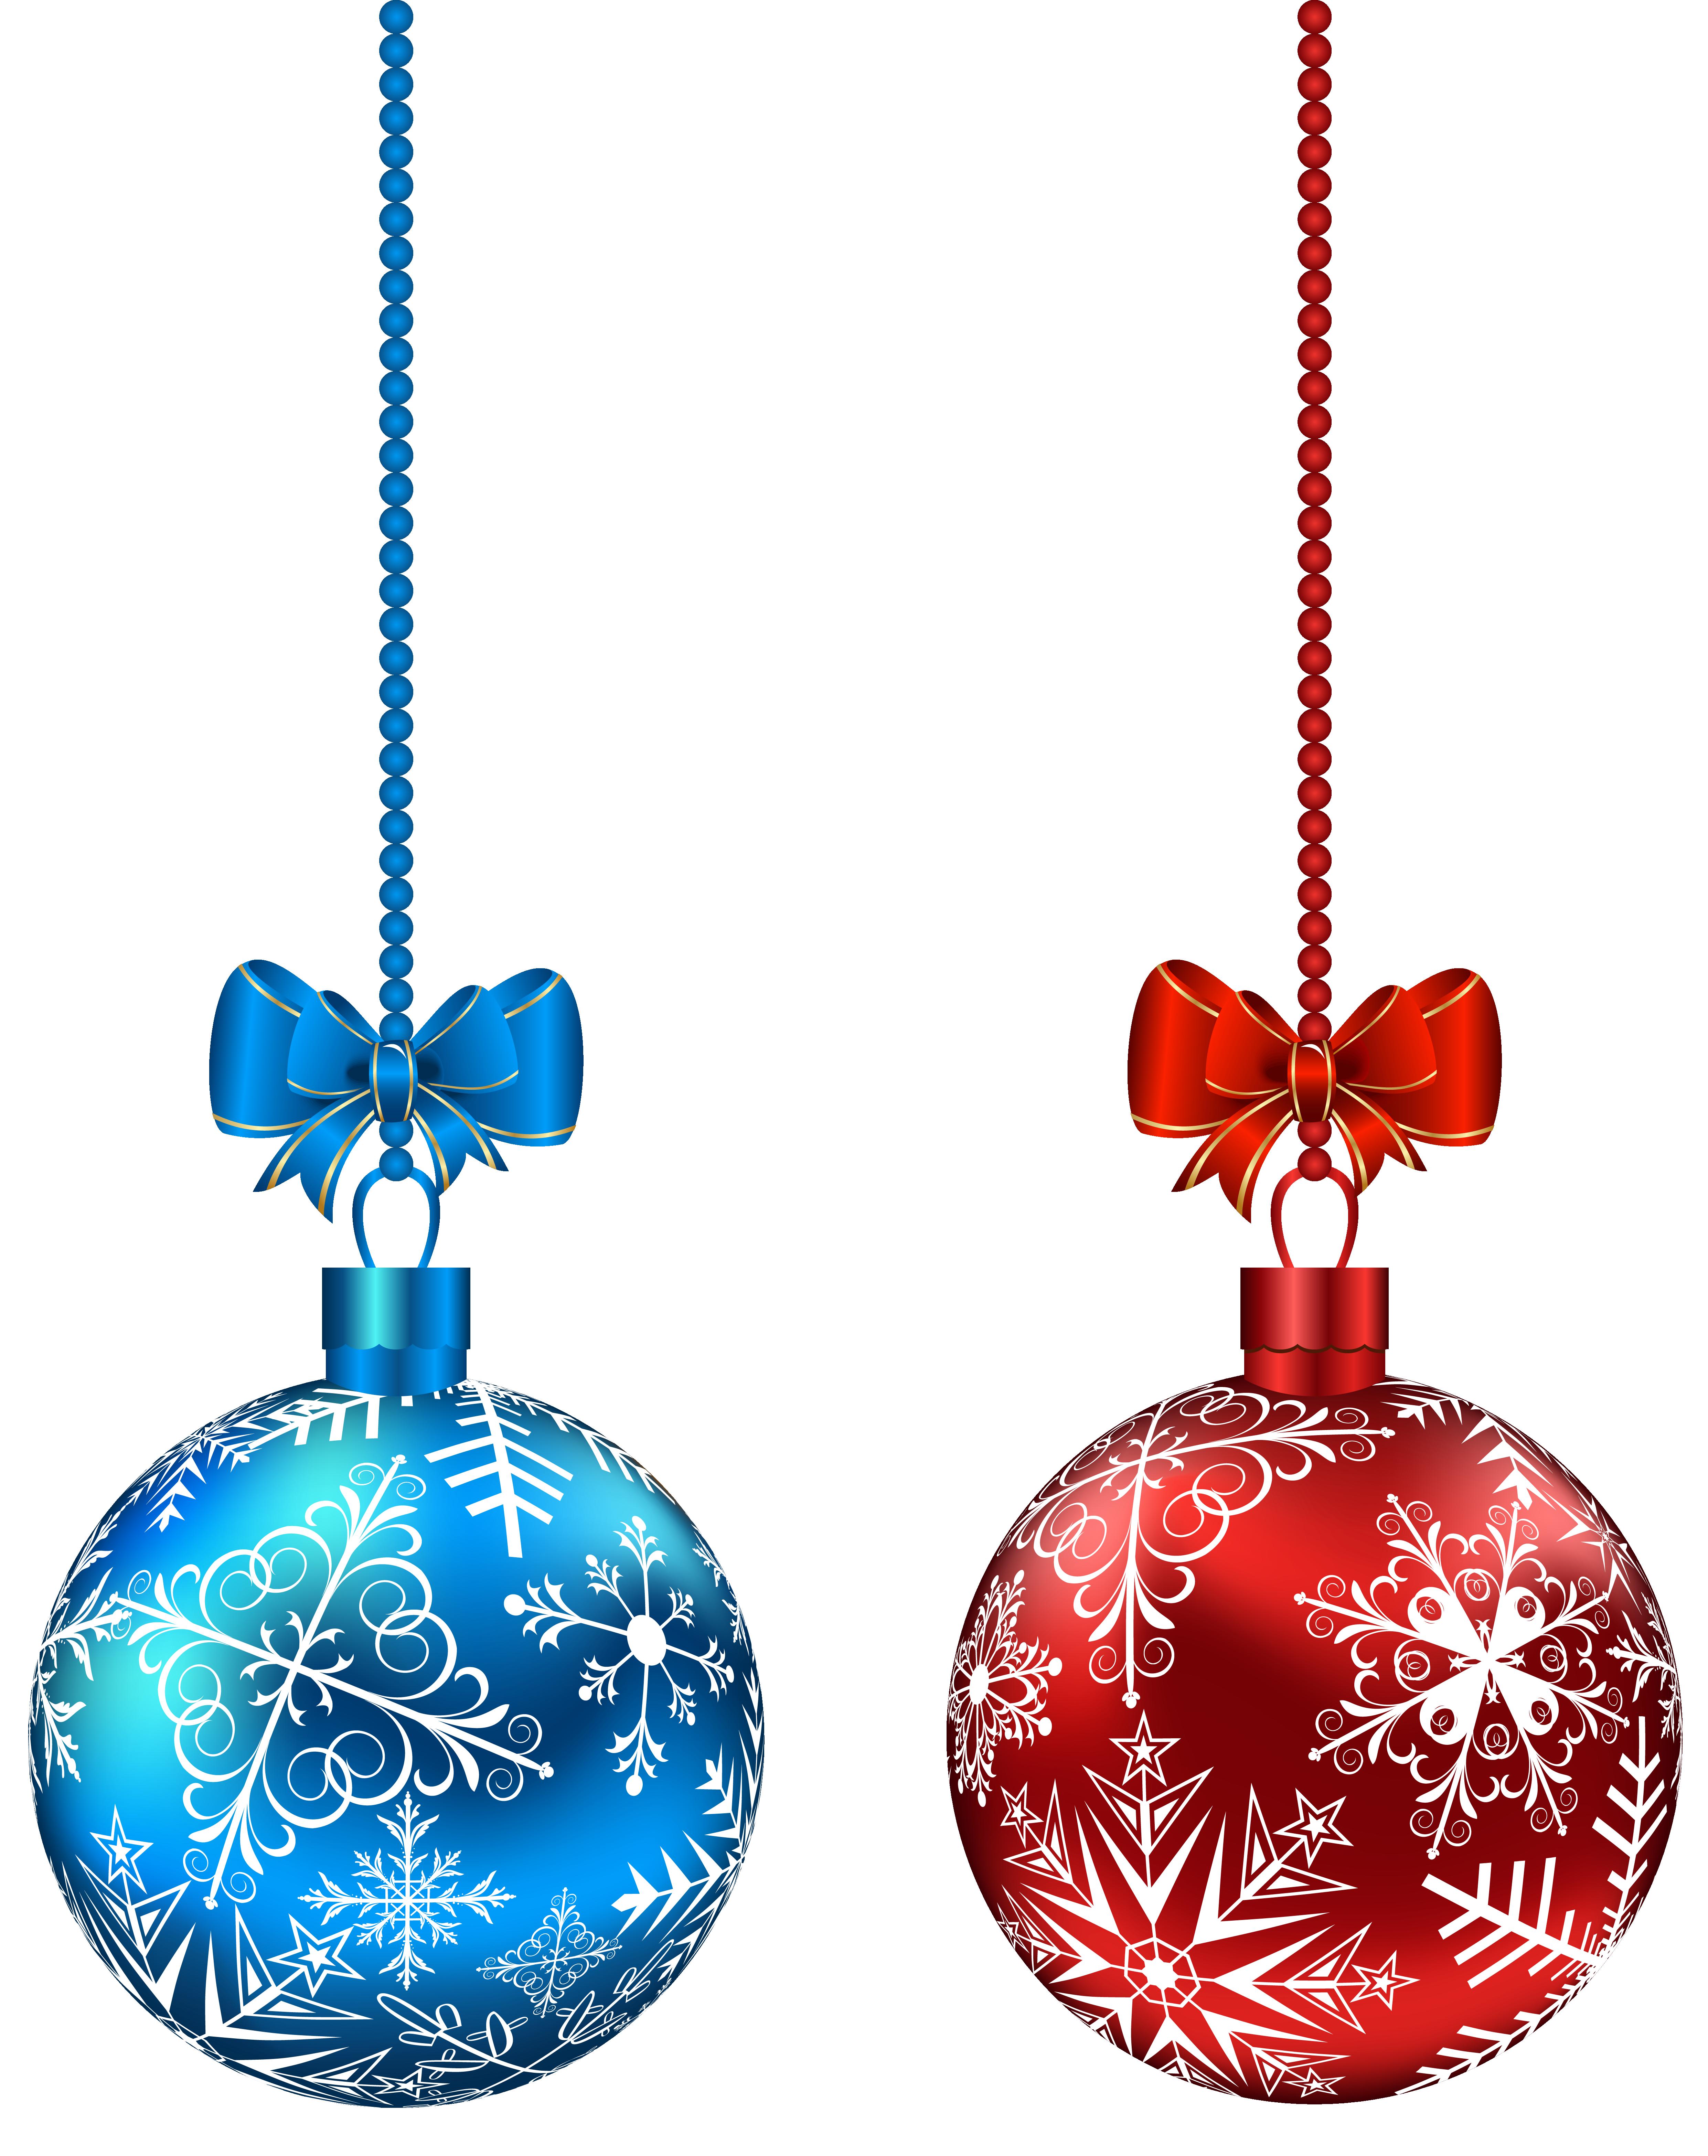 Christmas Ball Ornaments Clipart at GetDrawings | Free ...